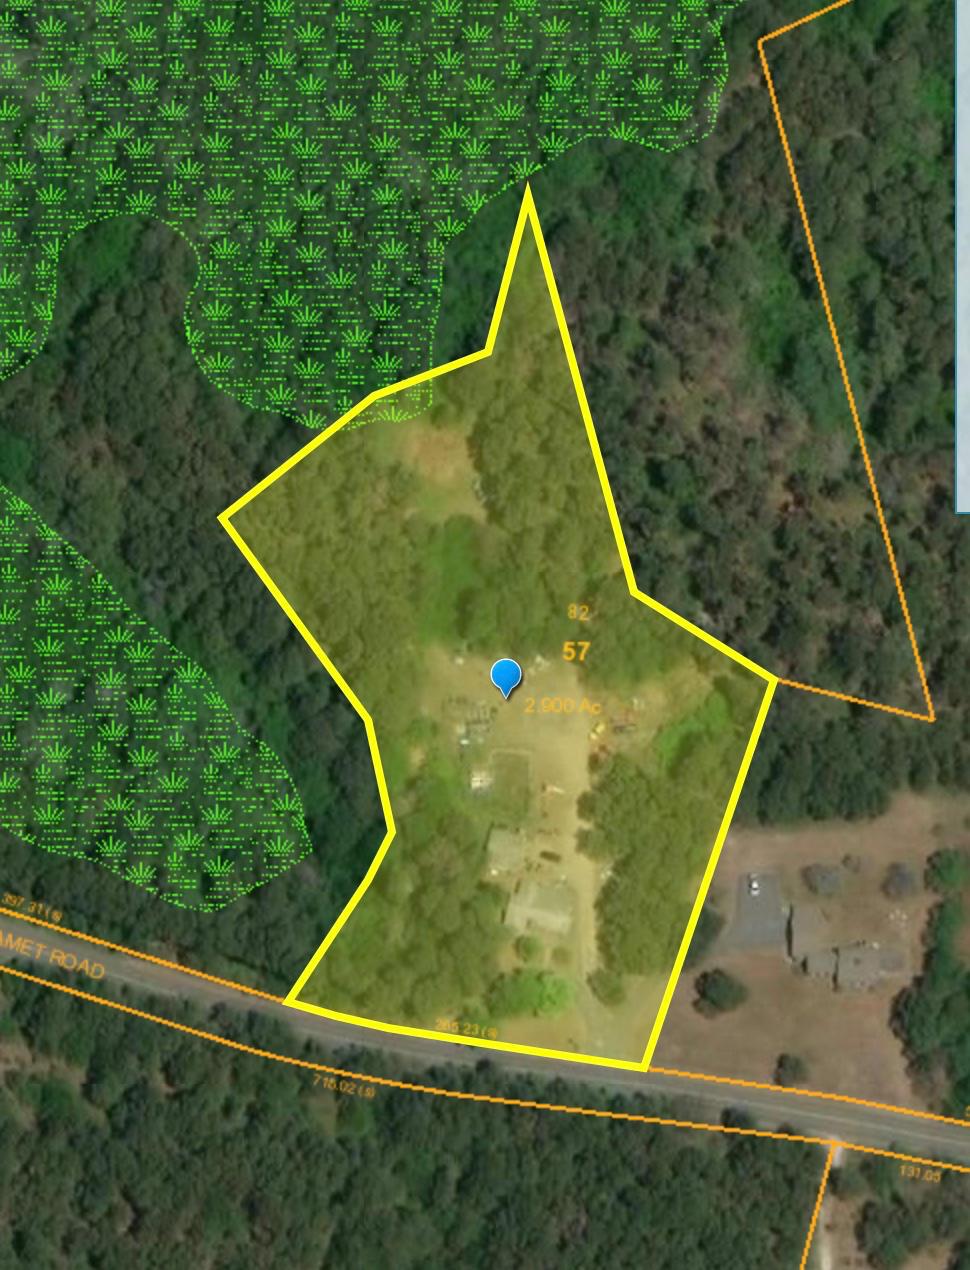 82 S Pamet Road, Truro MA, 02666 details